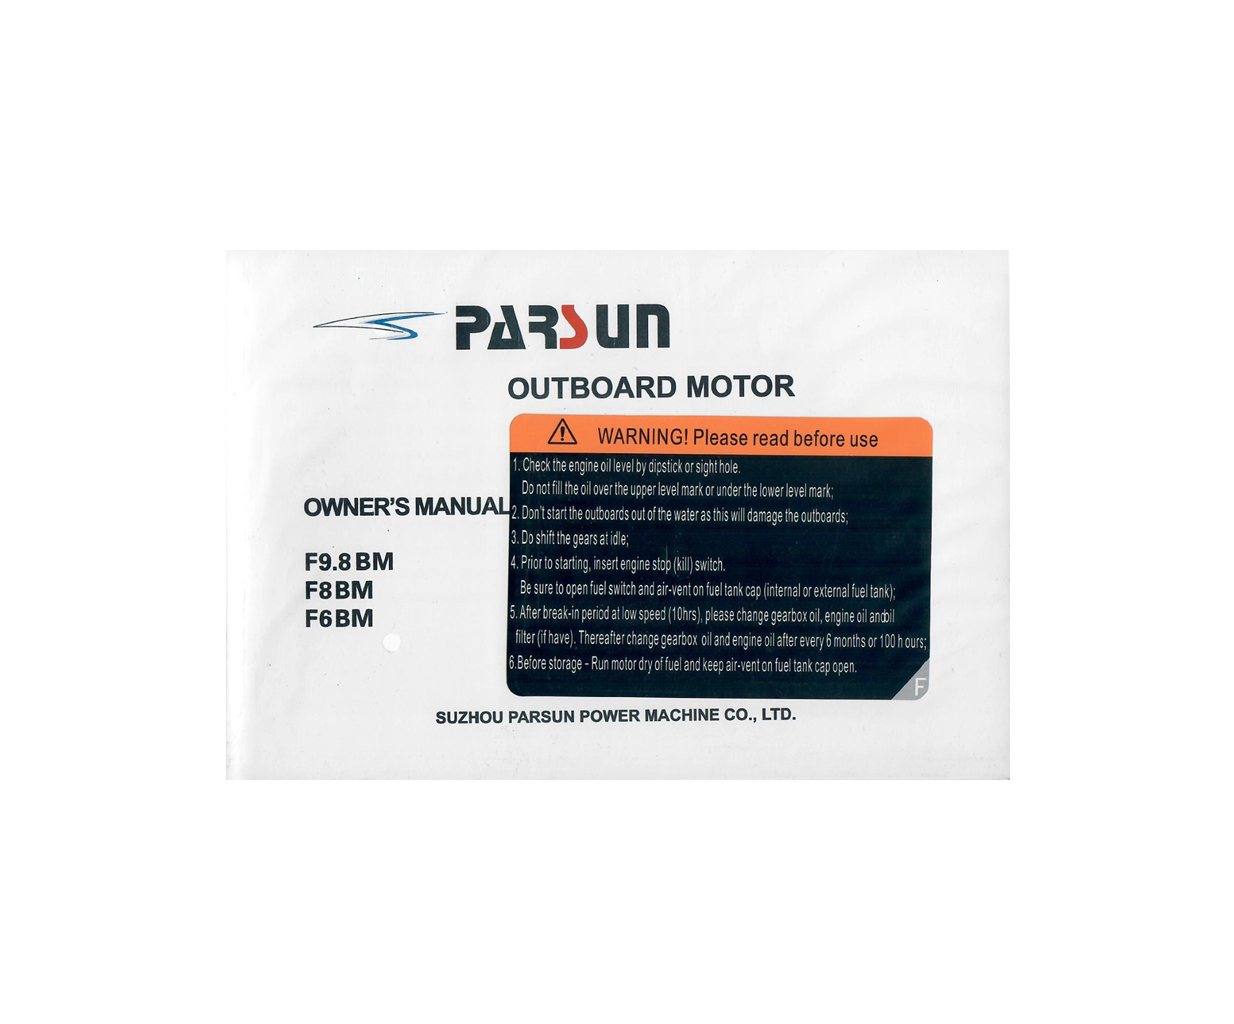 Yamaha/Parsun outboard F9.8BM/F8BM/F6BM owner's manual